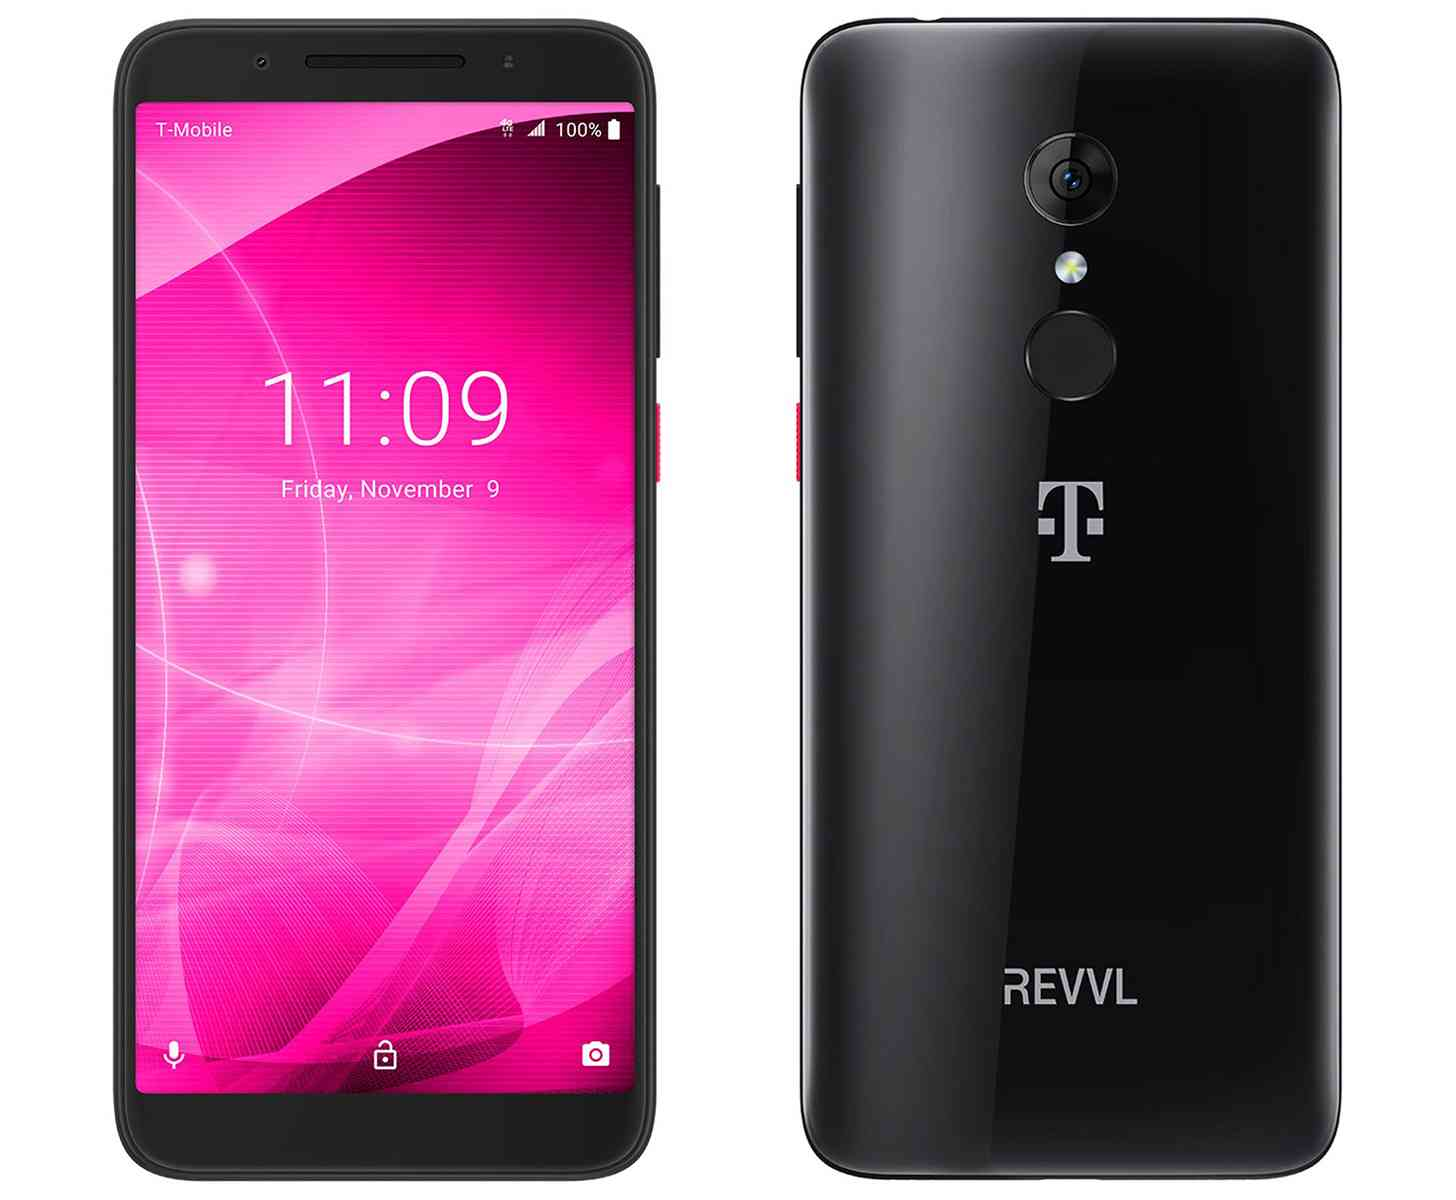 T-Mobile Revvl 2 official